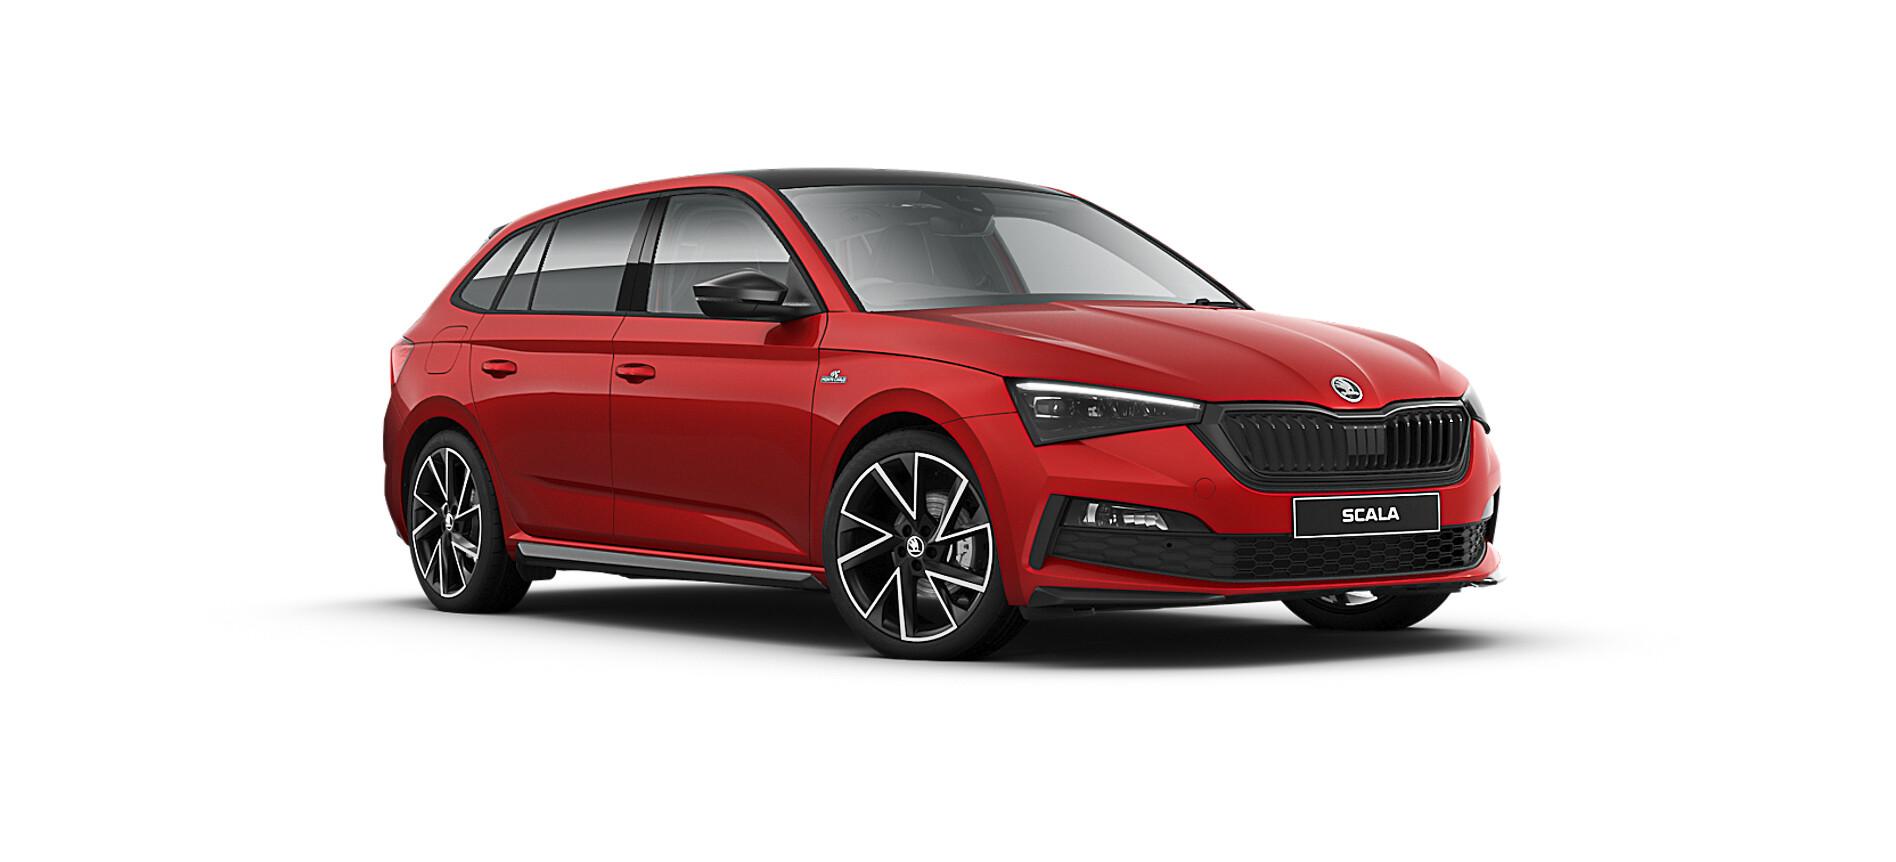 2020 Skoda Scala hatchback Australian pricing